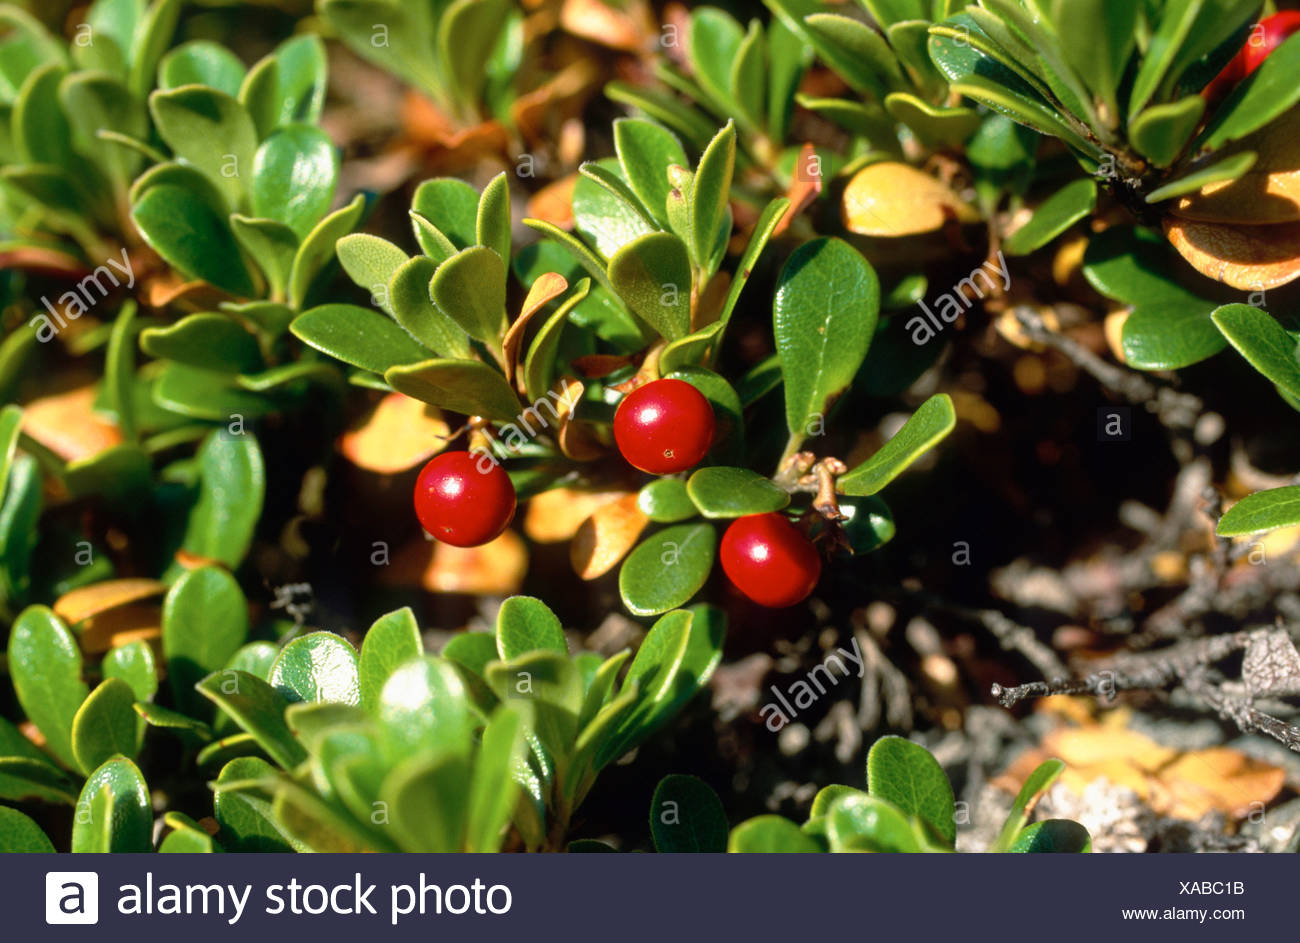 bearberry (Arctostaphylos uva-ursi), fruiting plant